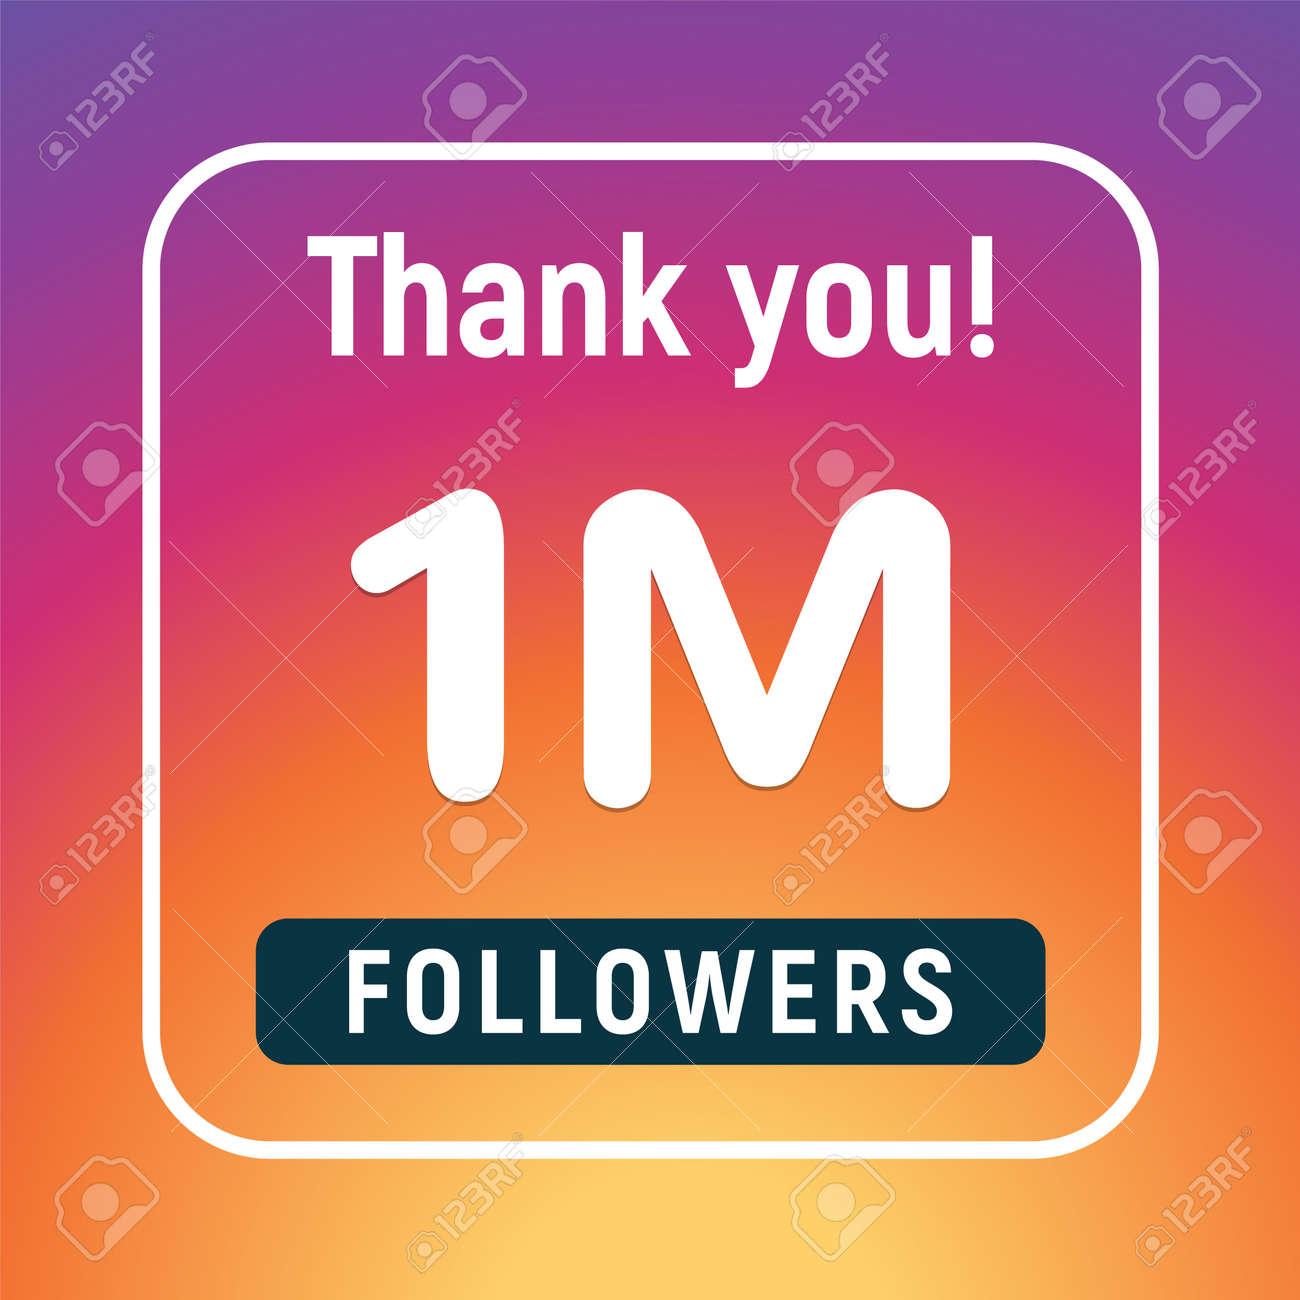 Thank you 1 million followers congratulation subscribe. 1m like follow anniversary - 168952987